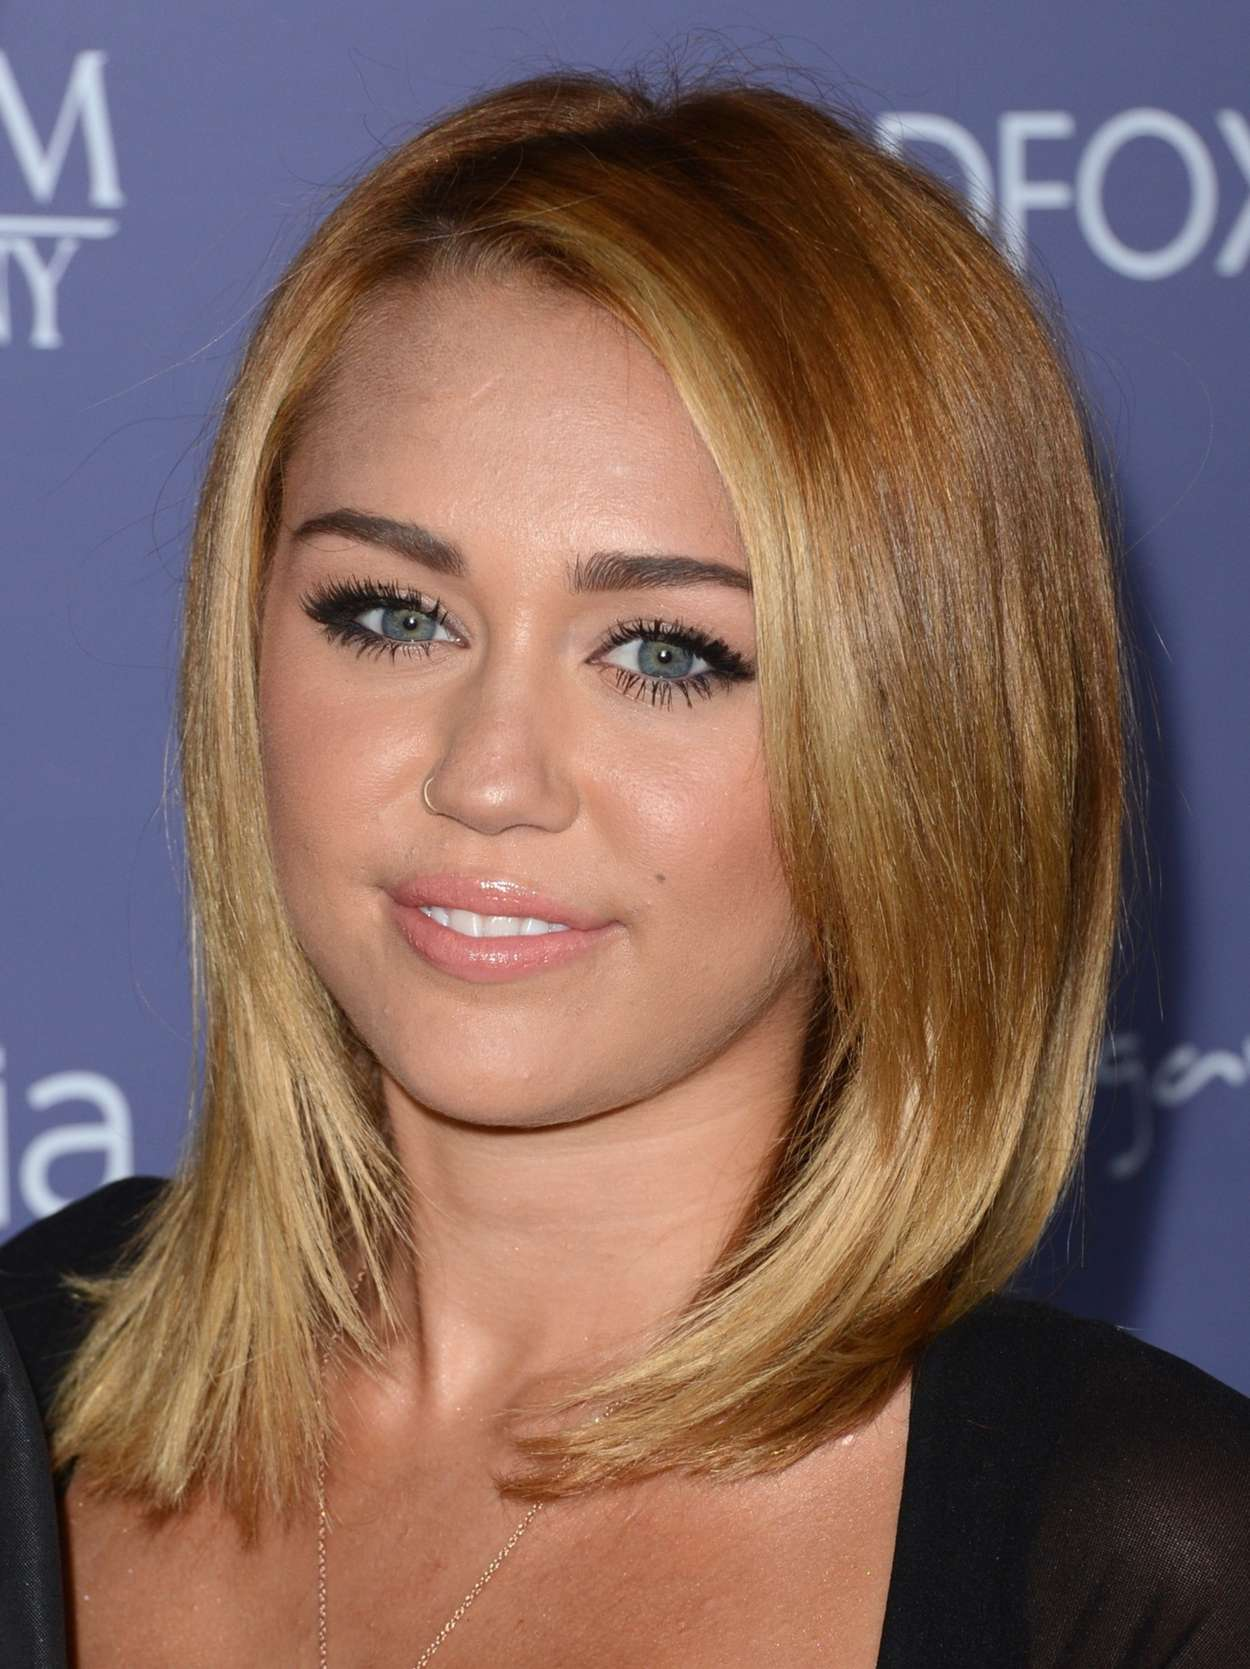 Miley Cyrus 2012 Australians In Film Awards 15 GotCeleb